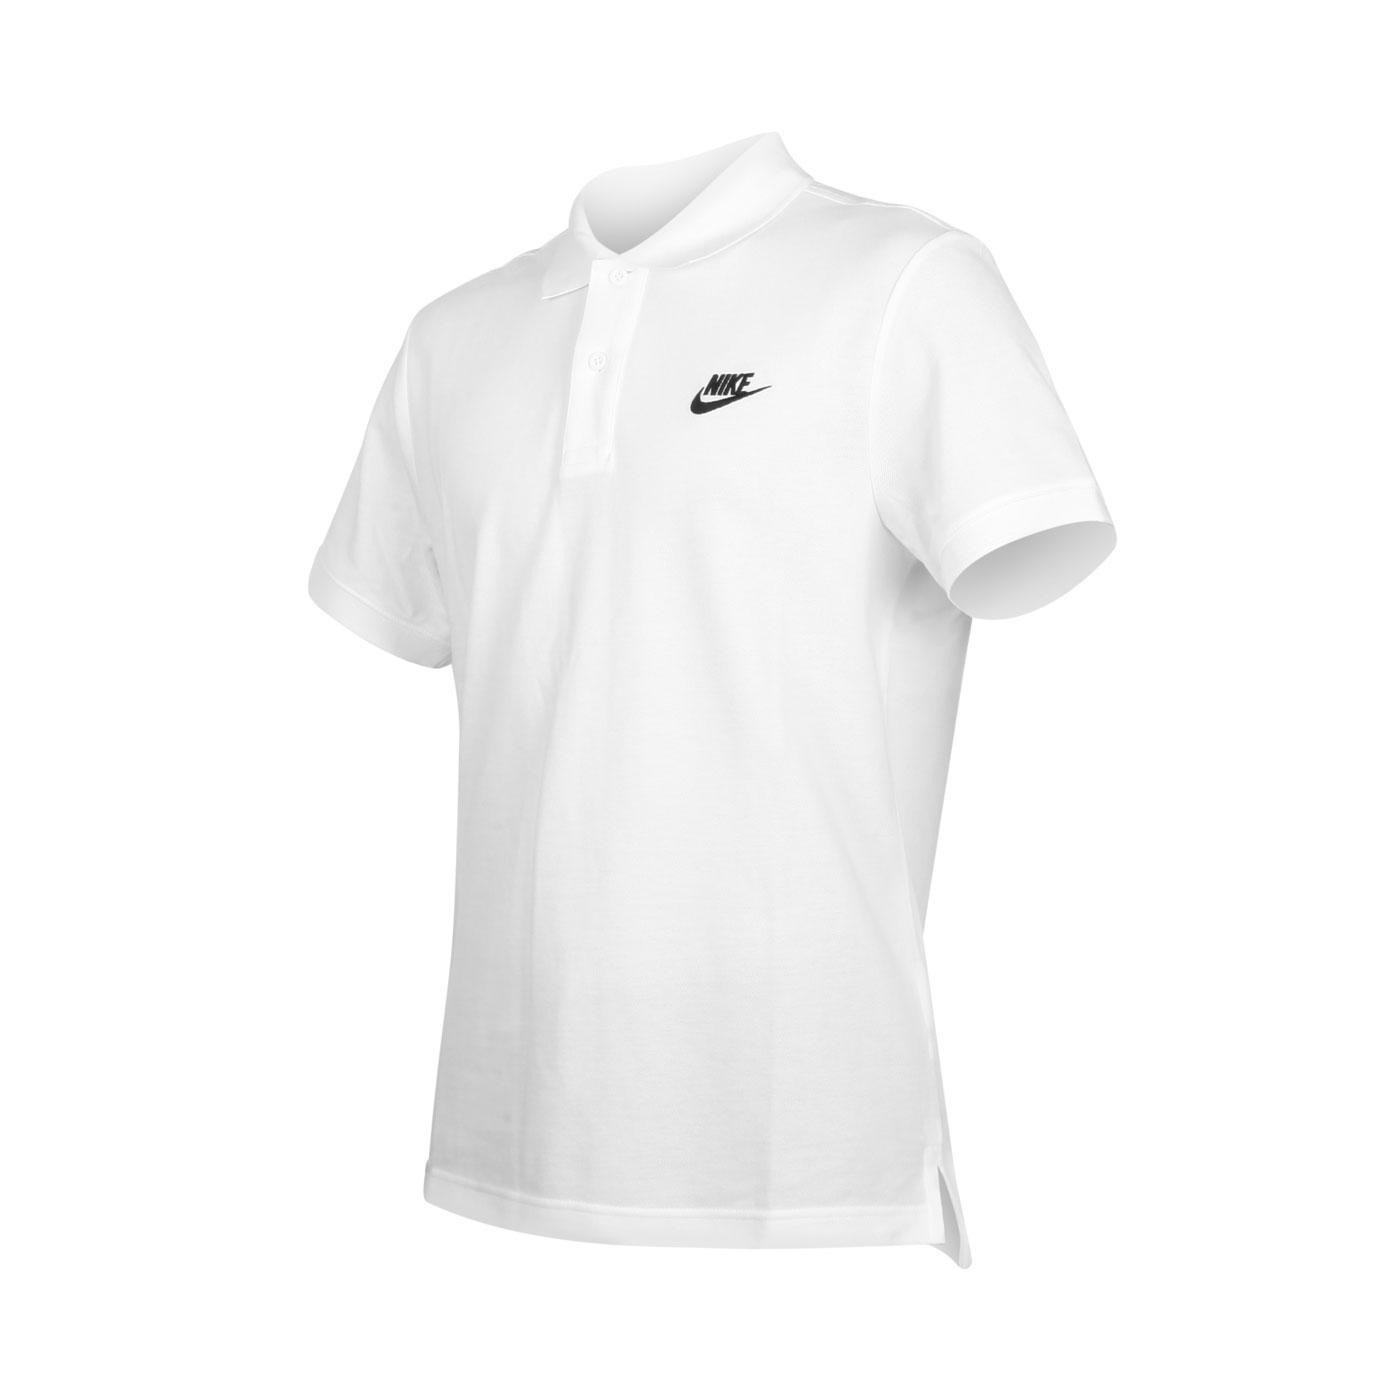 NIKE 男款短袖POLO衫 CJ4457-100 - 白黑